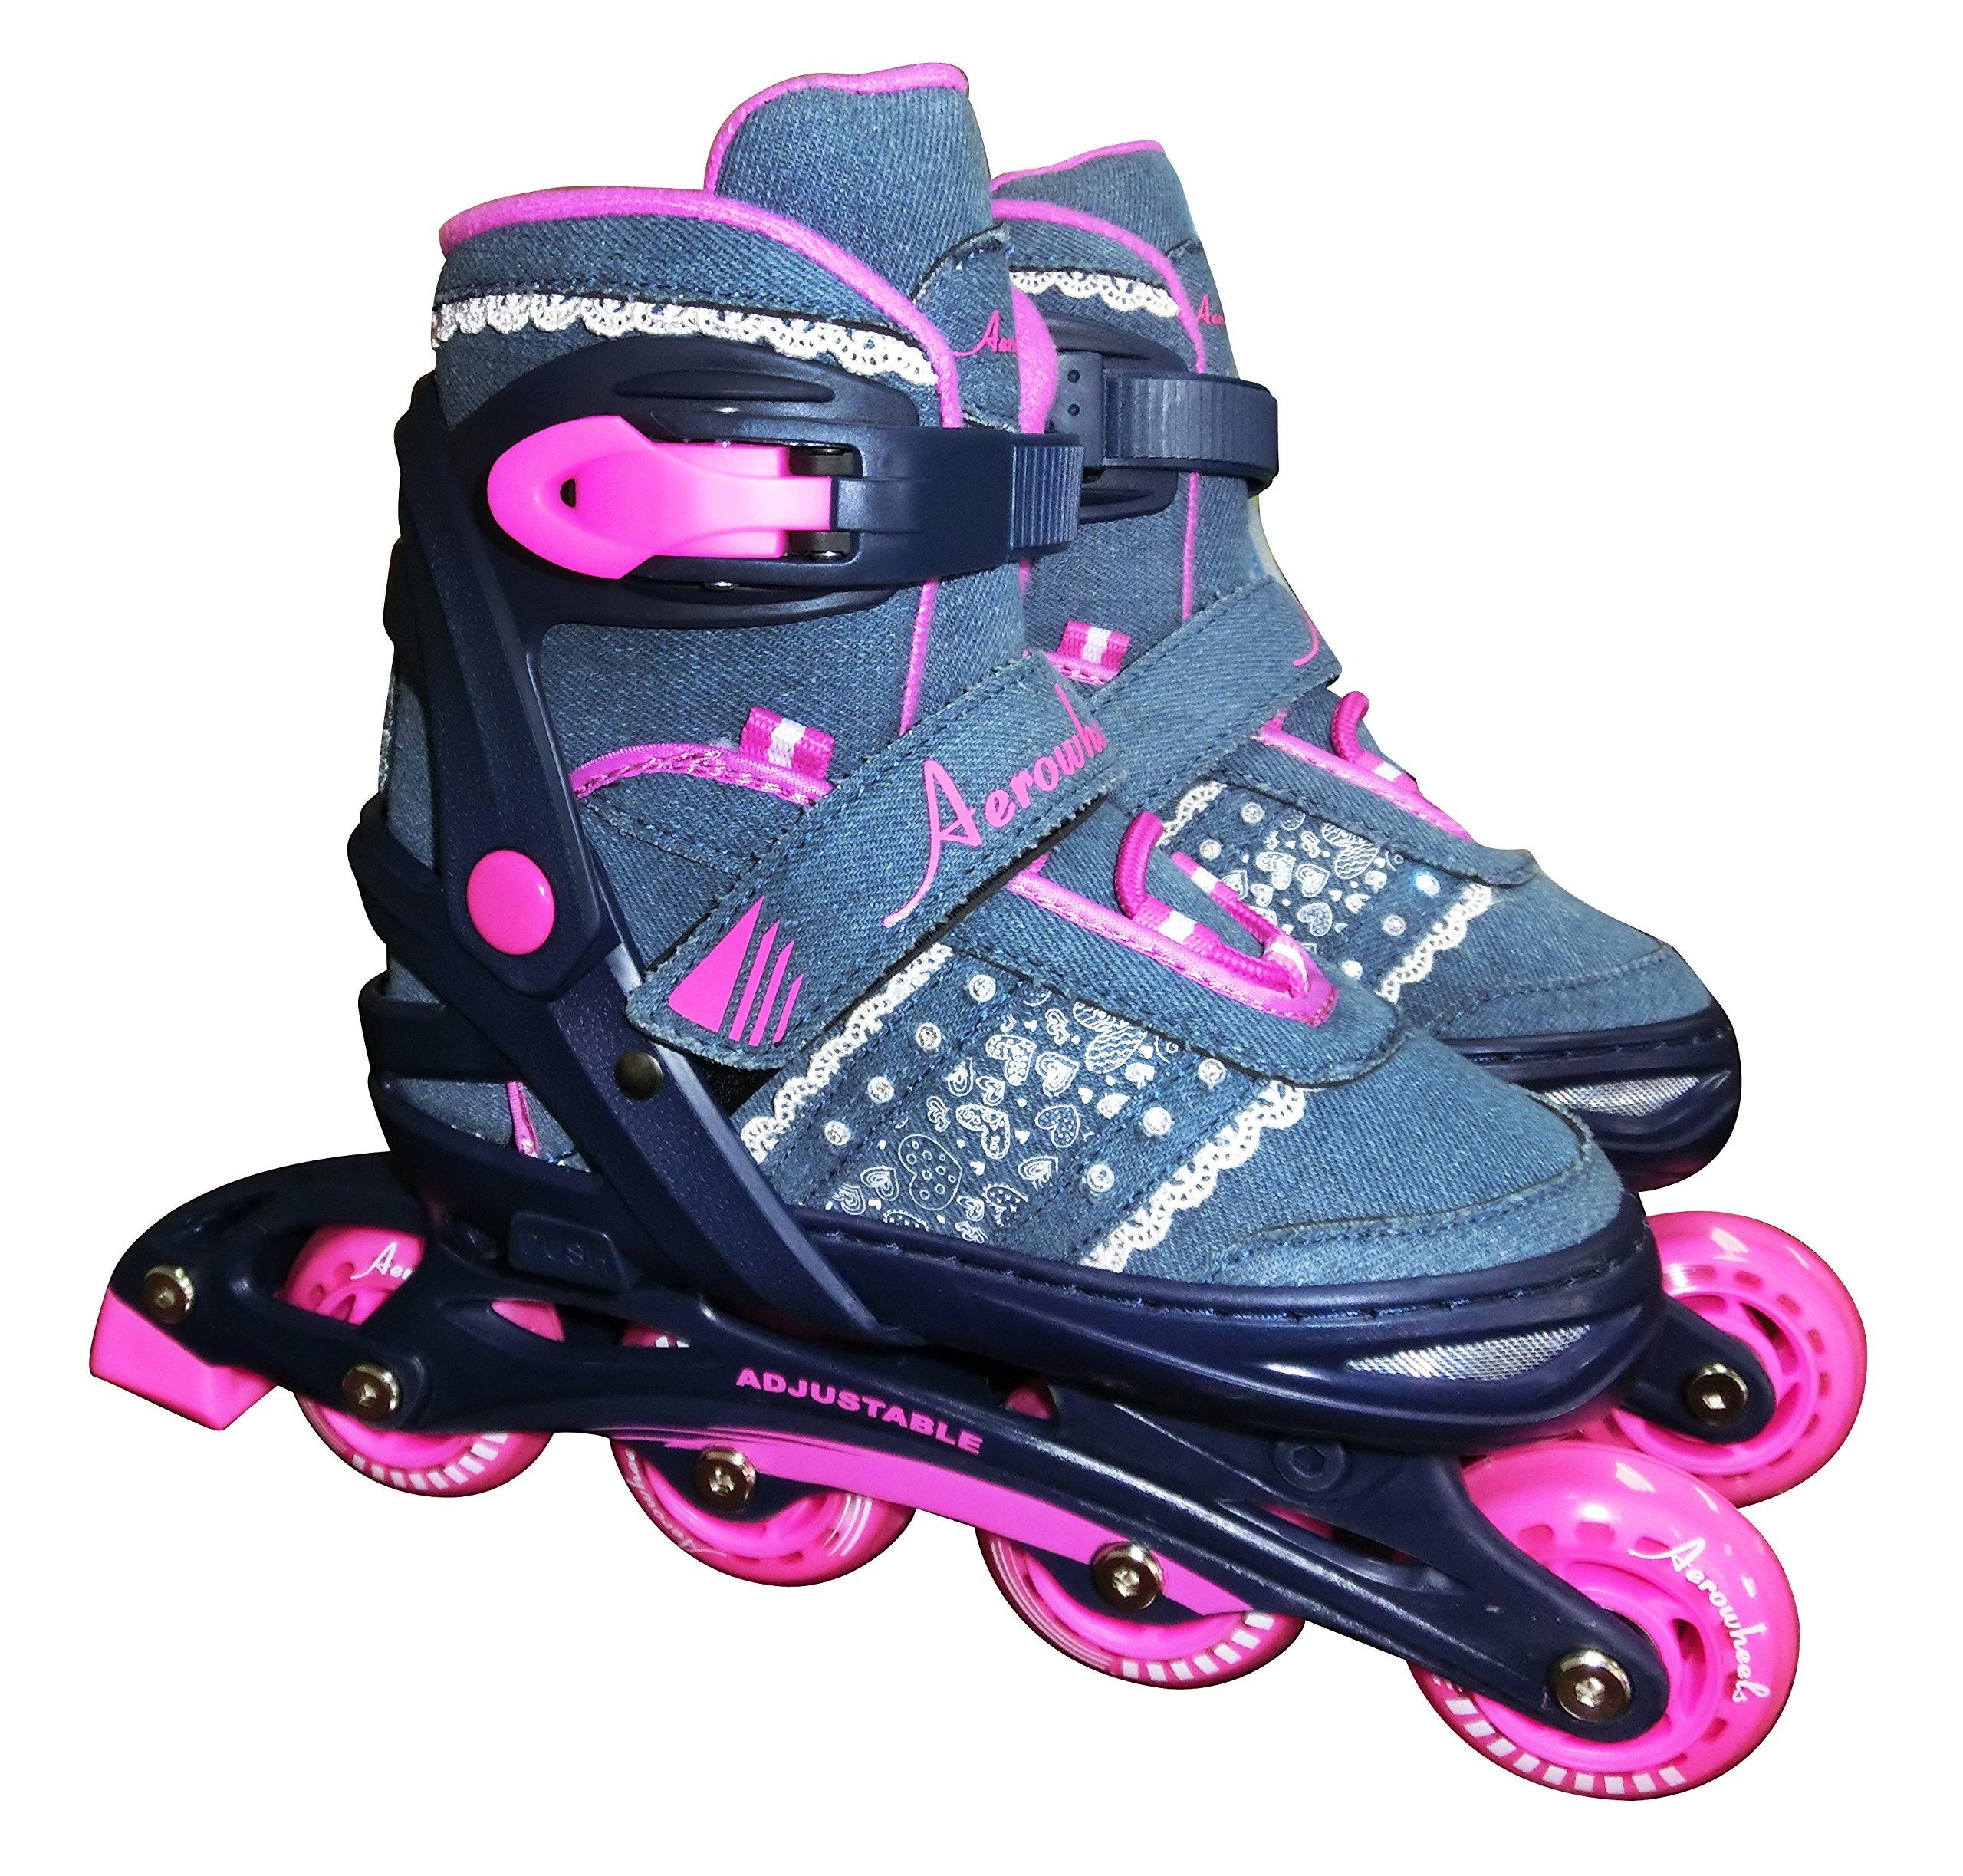 JNJ Aerowheels Kids Denim Inline Skates, Denim Blue, One Size